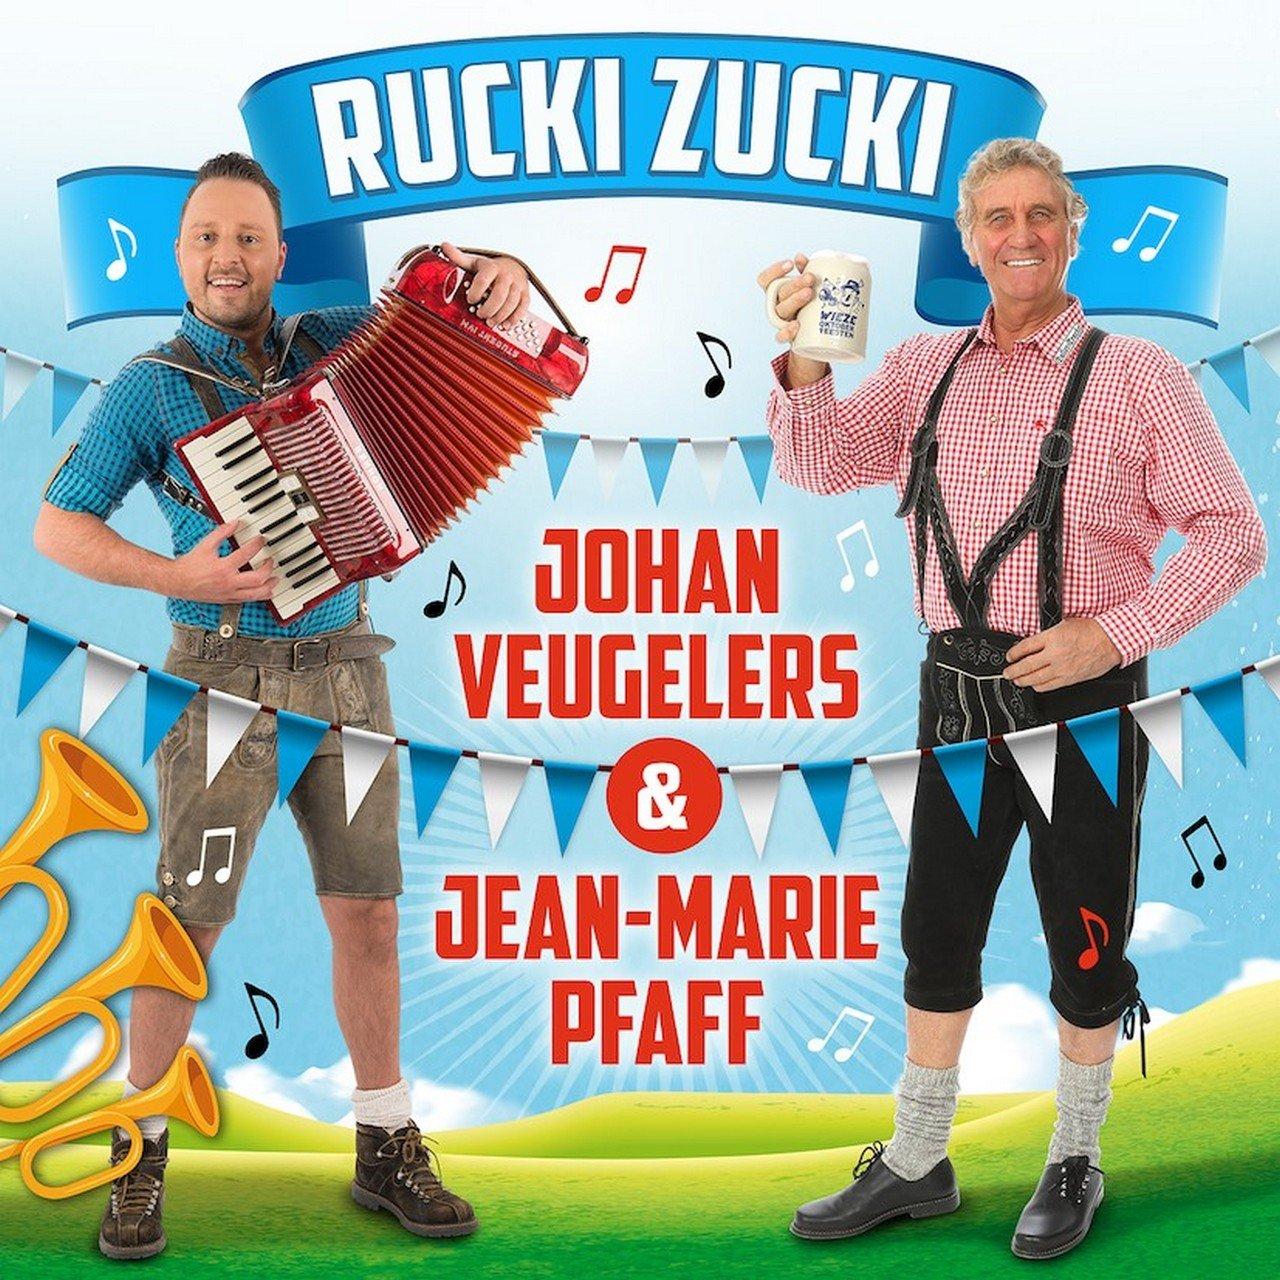 Johan Veugelers en Jean-Marie Pfaff lanceren hun veelbesproken duetsingle 'Rucki Zucki' - Hoes Rucki Zucki